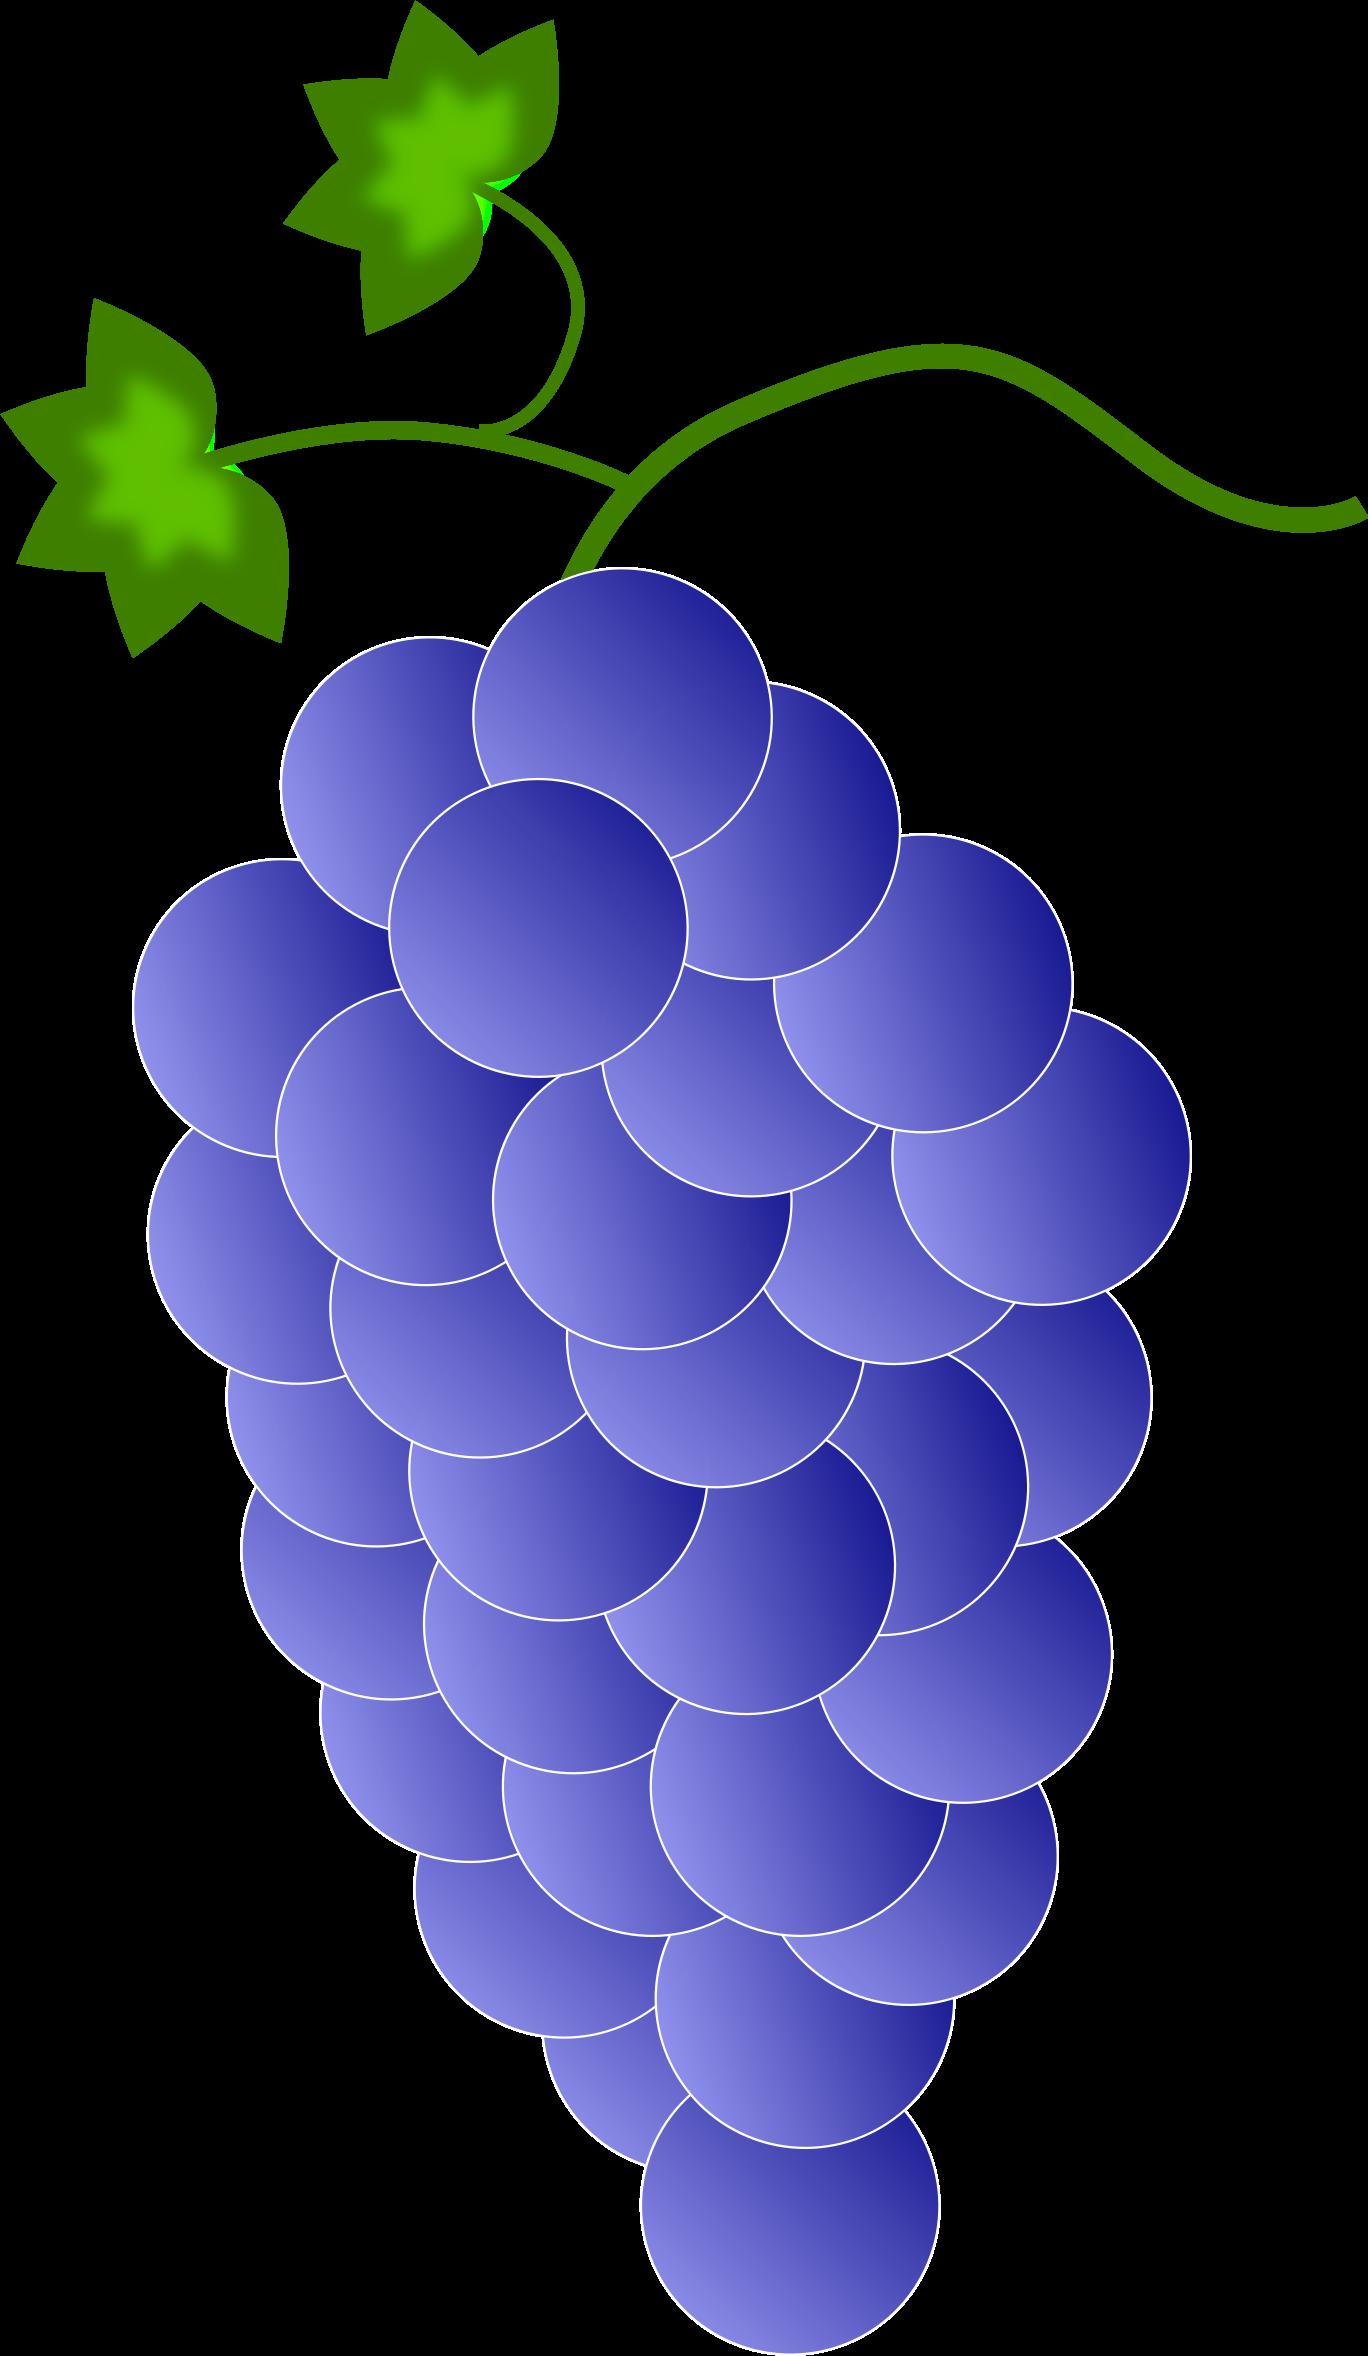 Colored blue big image. Grapes clipart violet